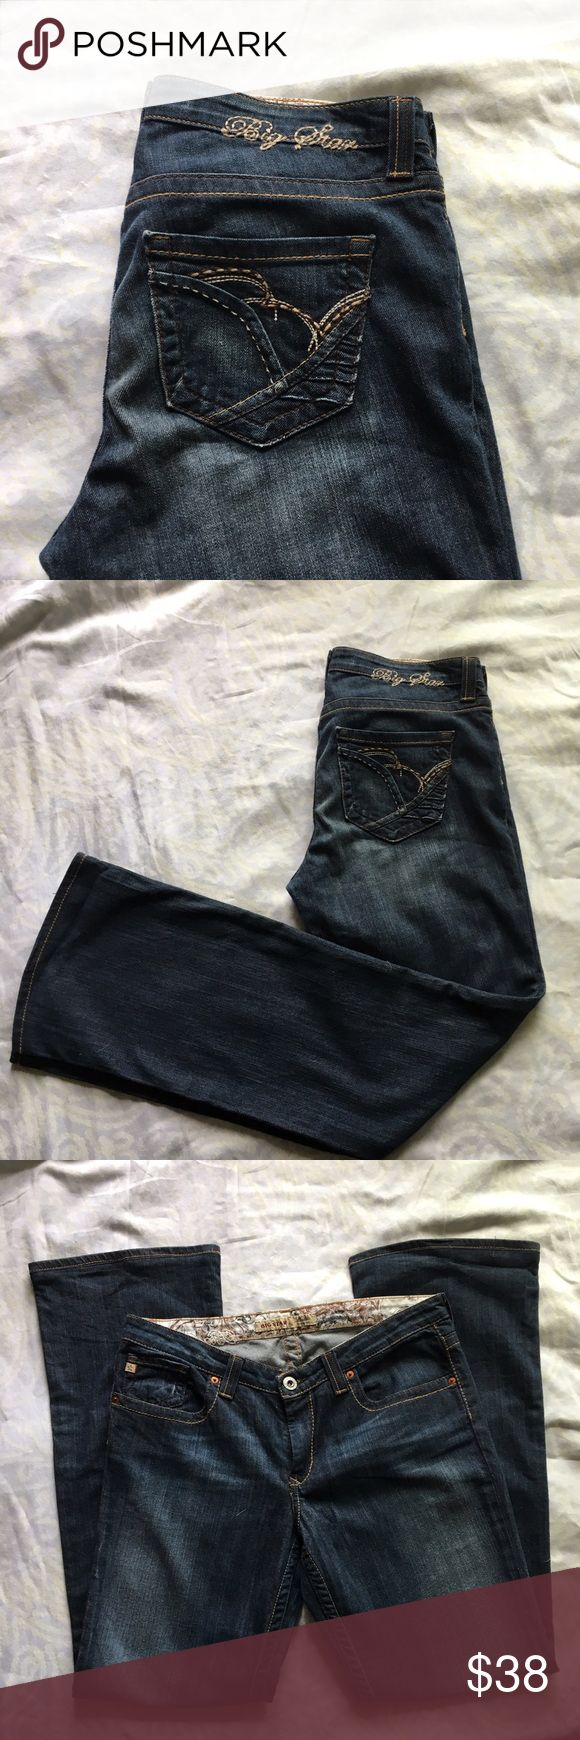 🔥Big Star Maddie jeans 32x 34 🔥Big Star Maddie jeans 32x 34 Big Star Jeans Boyfriend